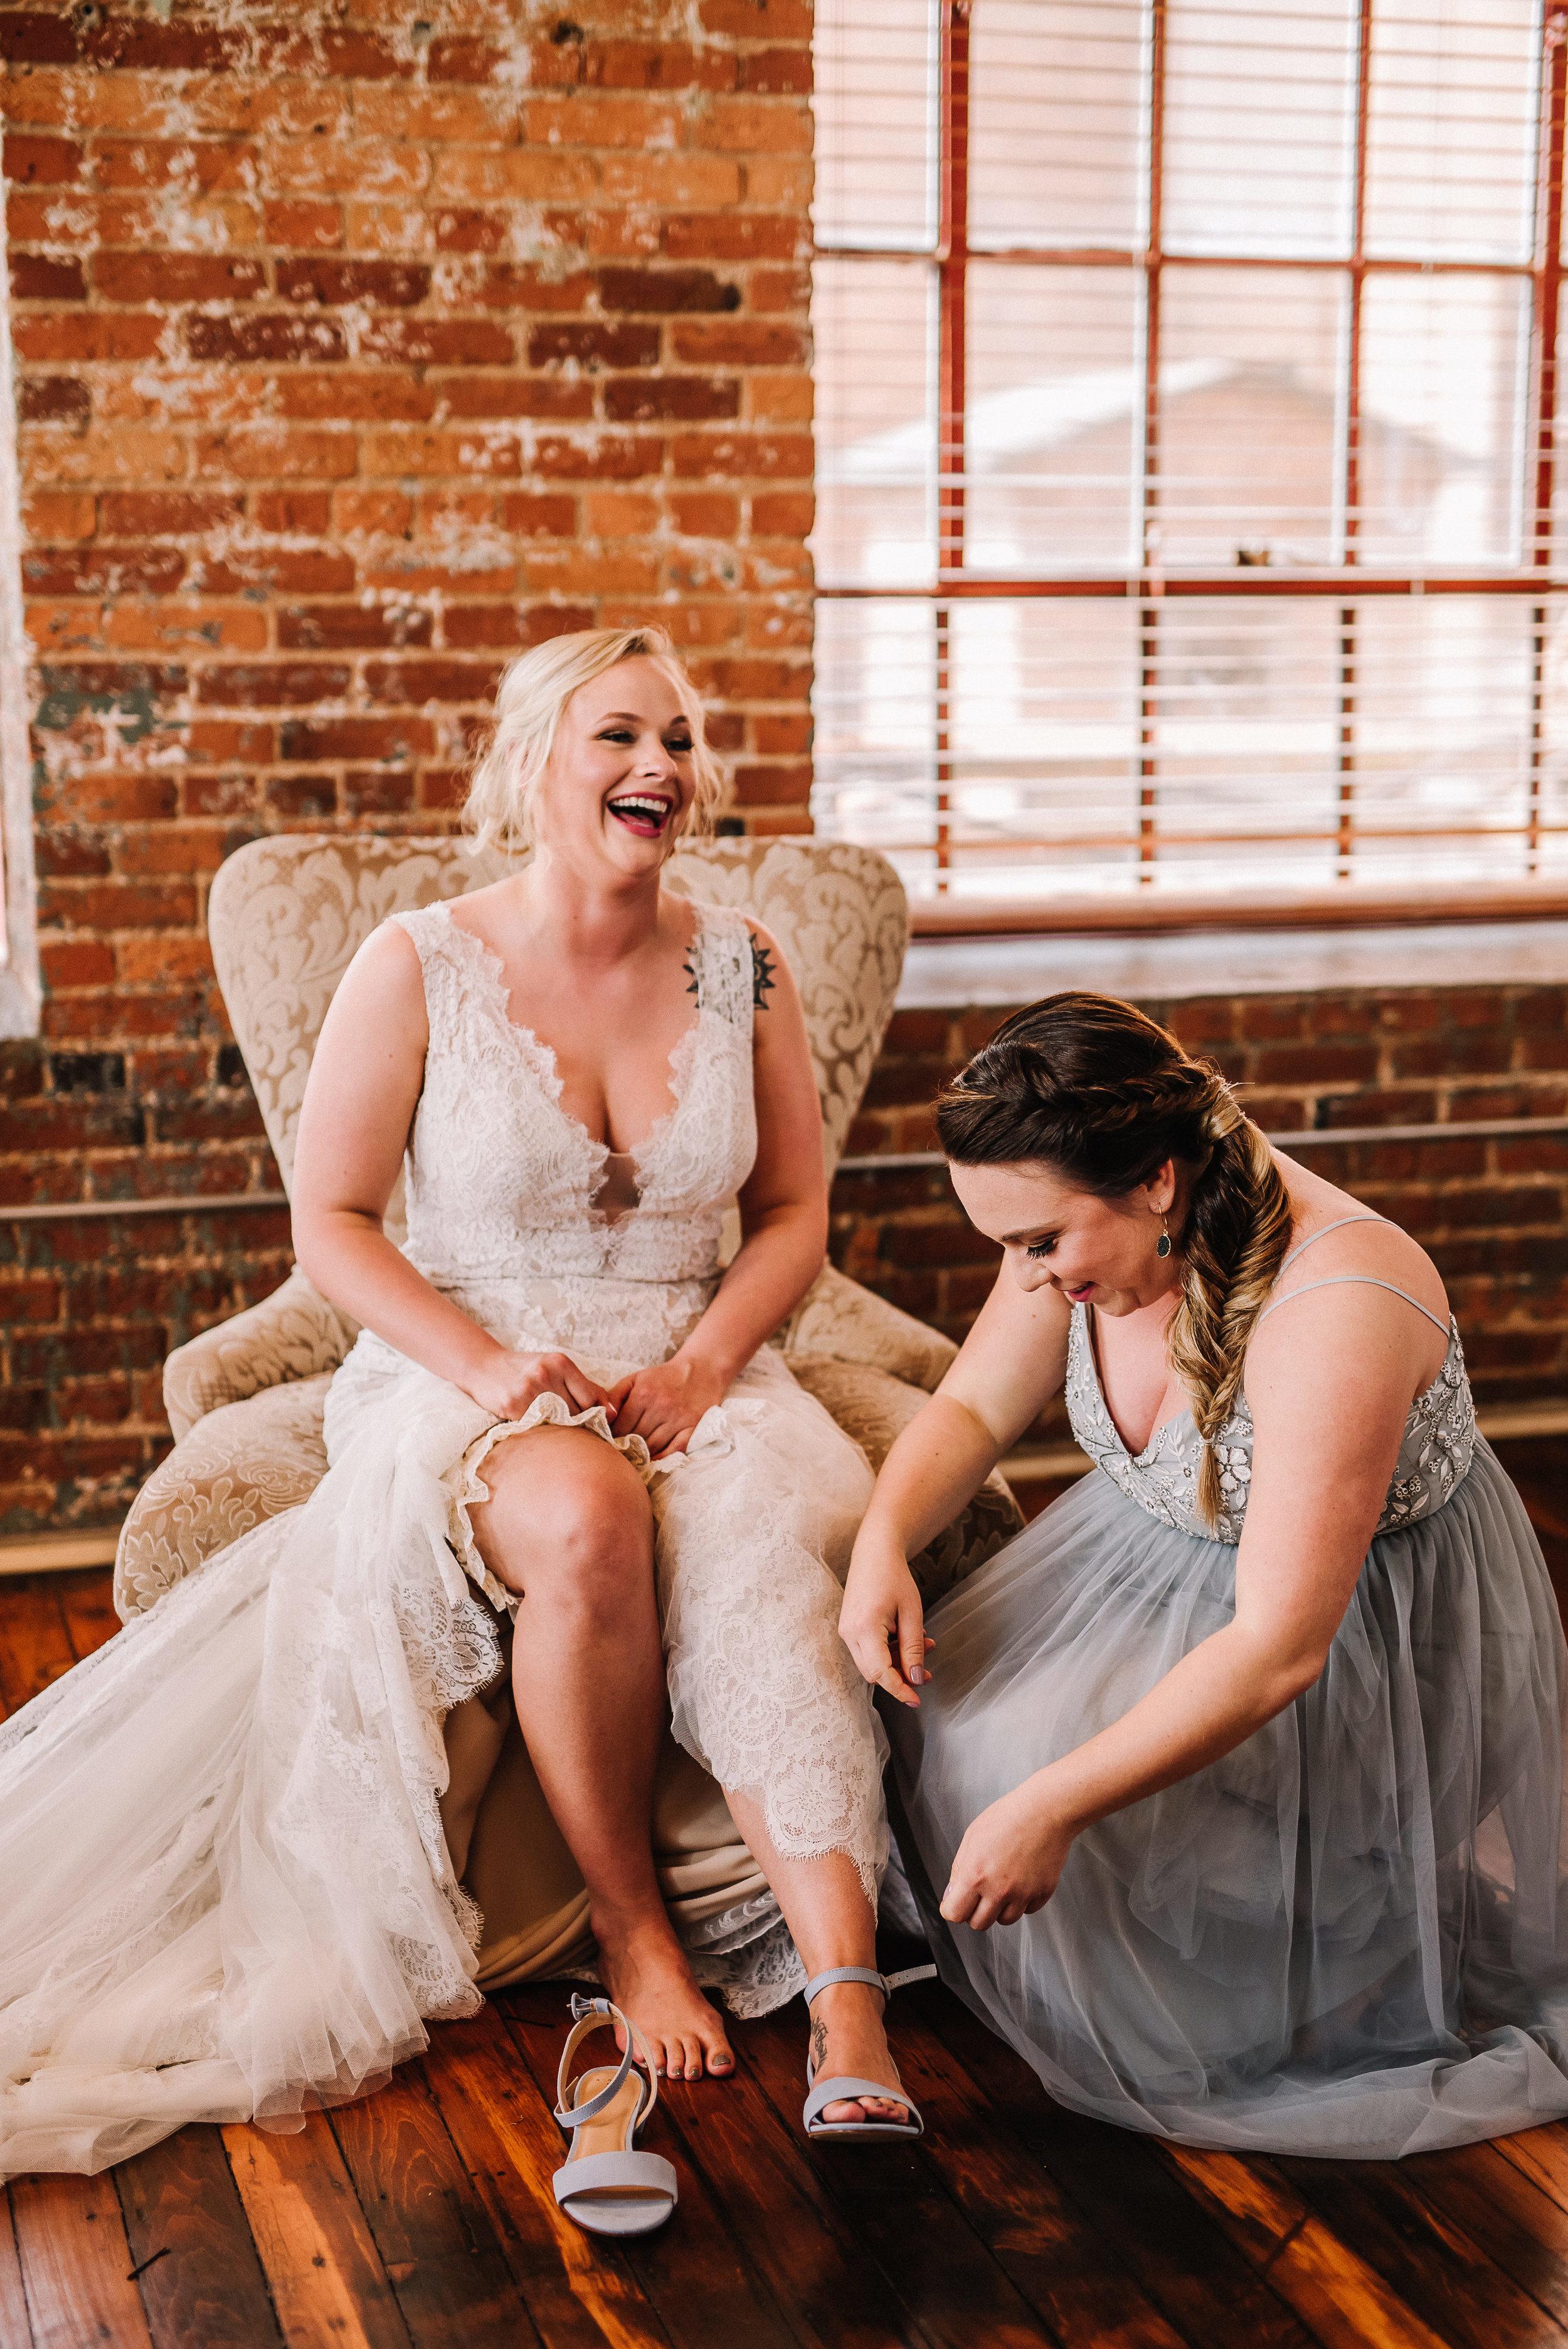 Morgan Wedding_Mill at Yellow River_Ashley Benham Photography-243.jpg